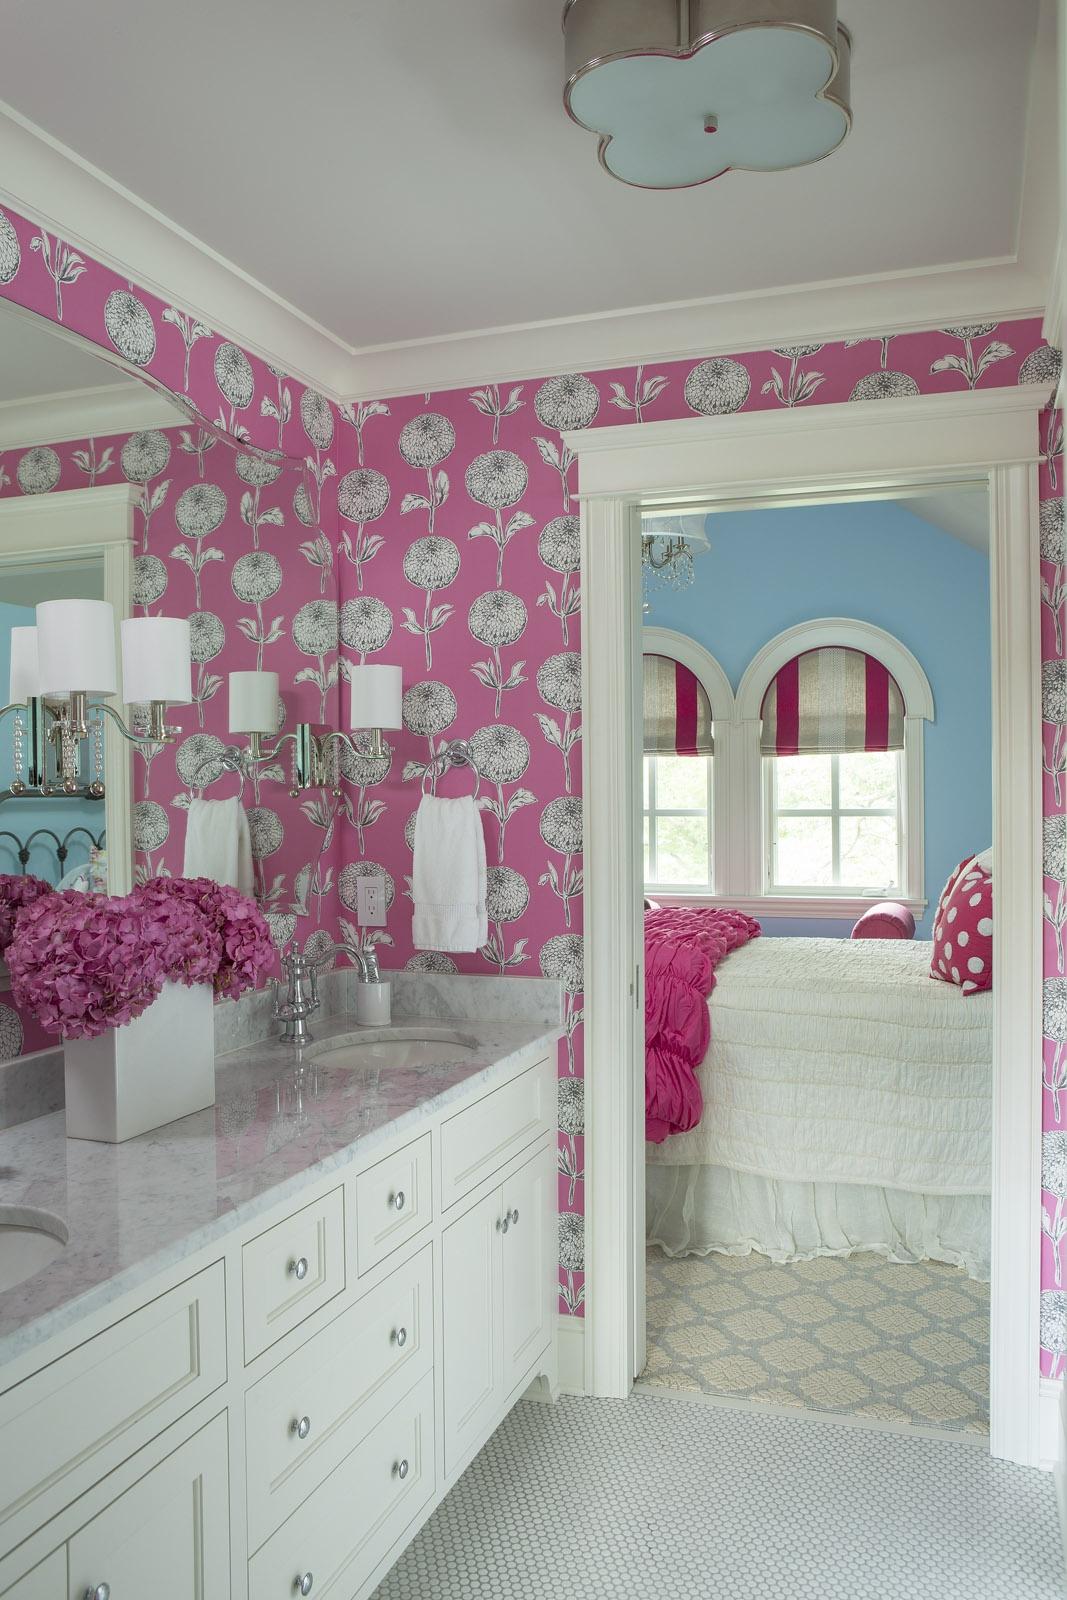 15 Reasons To Love Bathroom Wallpaper on Bathroom Models  id=91533